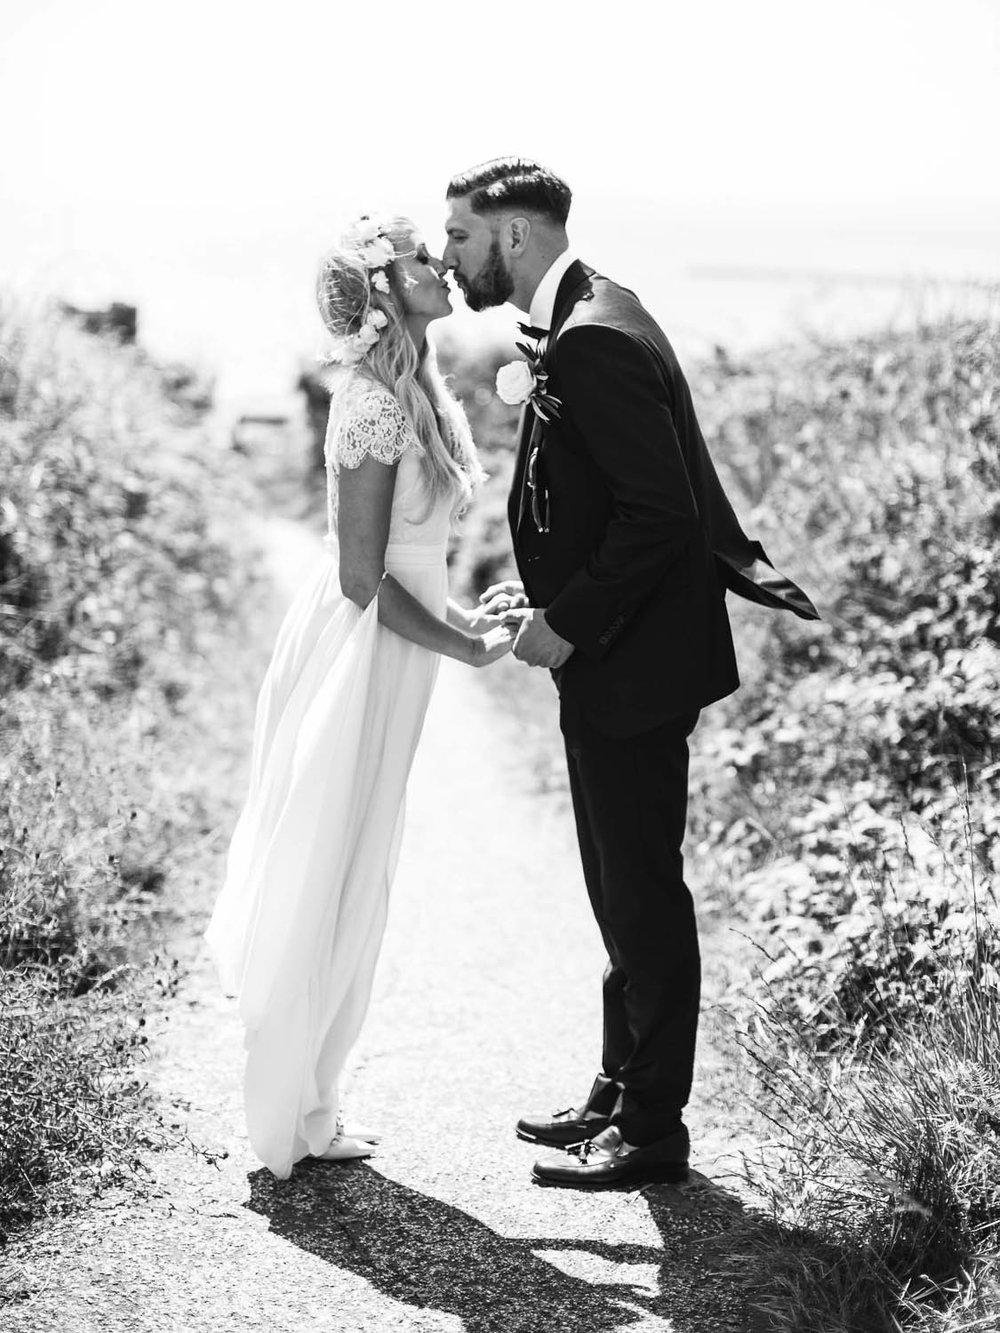 Amy O'Boyle Photography, Destination & UK Fine Art Film Wedding Photographer, Hastings Wedding-15.jpg